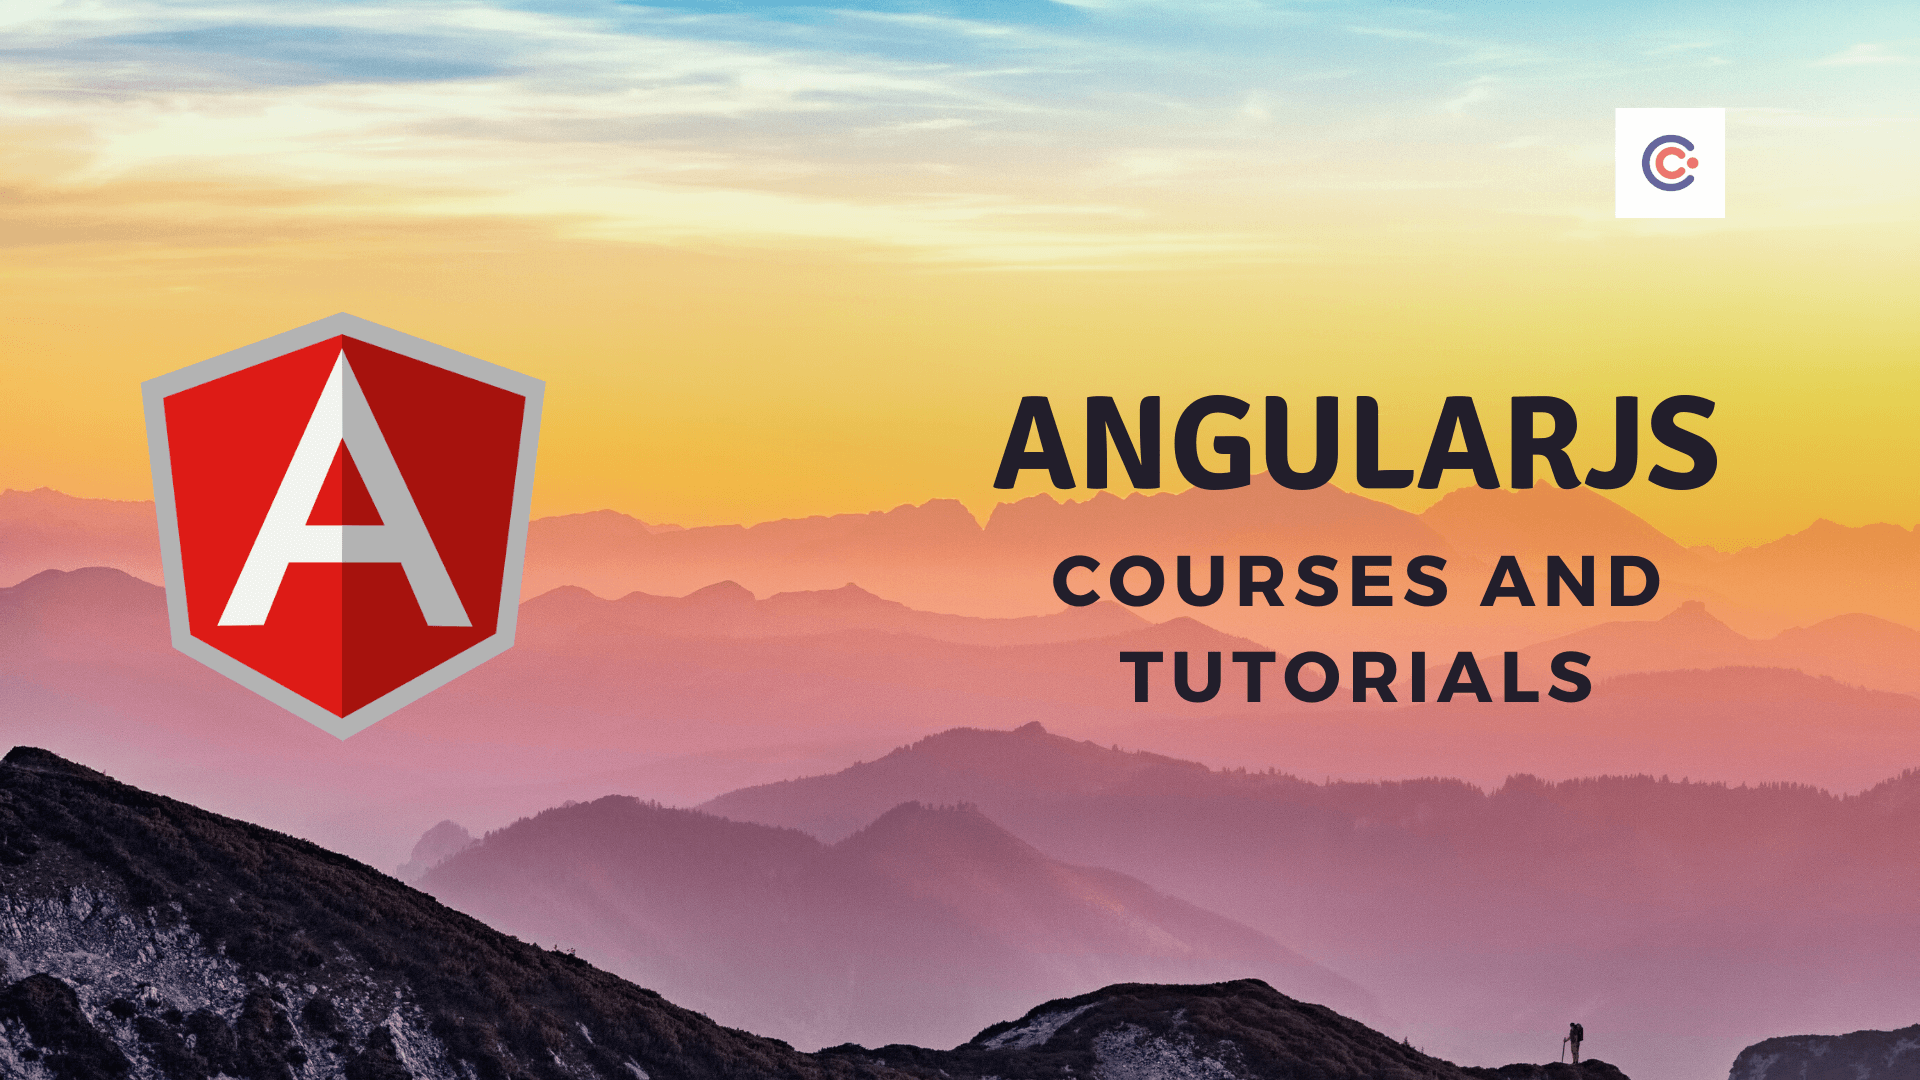 11 Best AngularJS Tutorials & Courses - Learn AngularJS Development Online